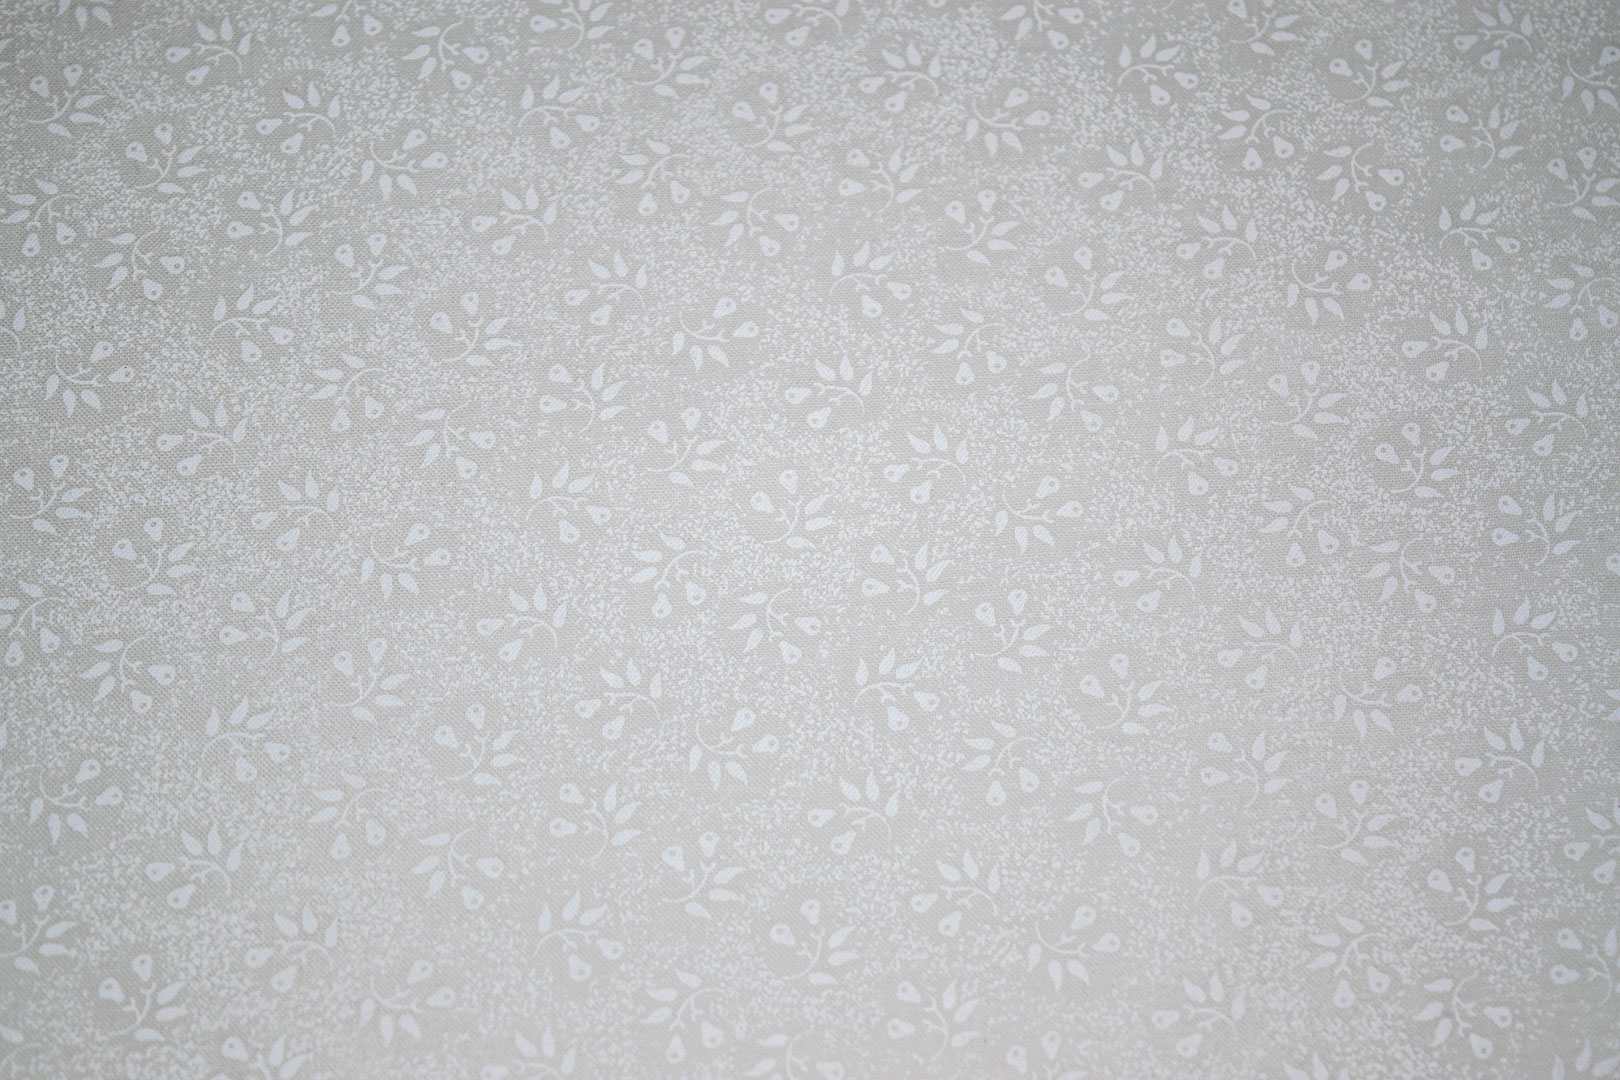 "8_36255_ww   44/45"" 68/68, 100% Carded Cotton"